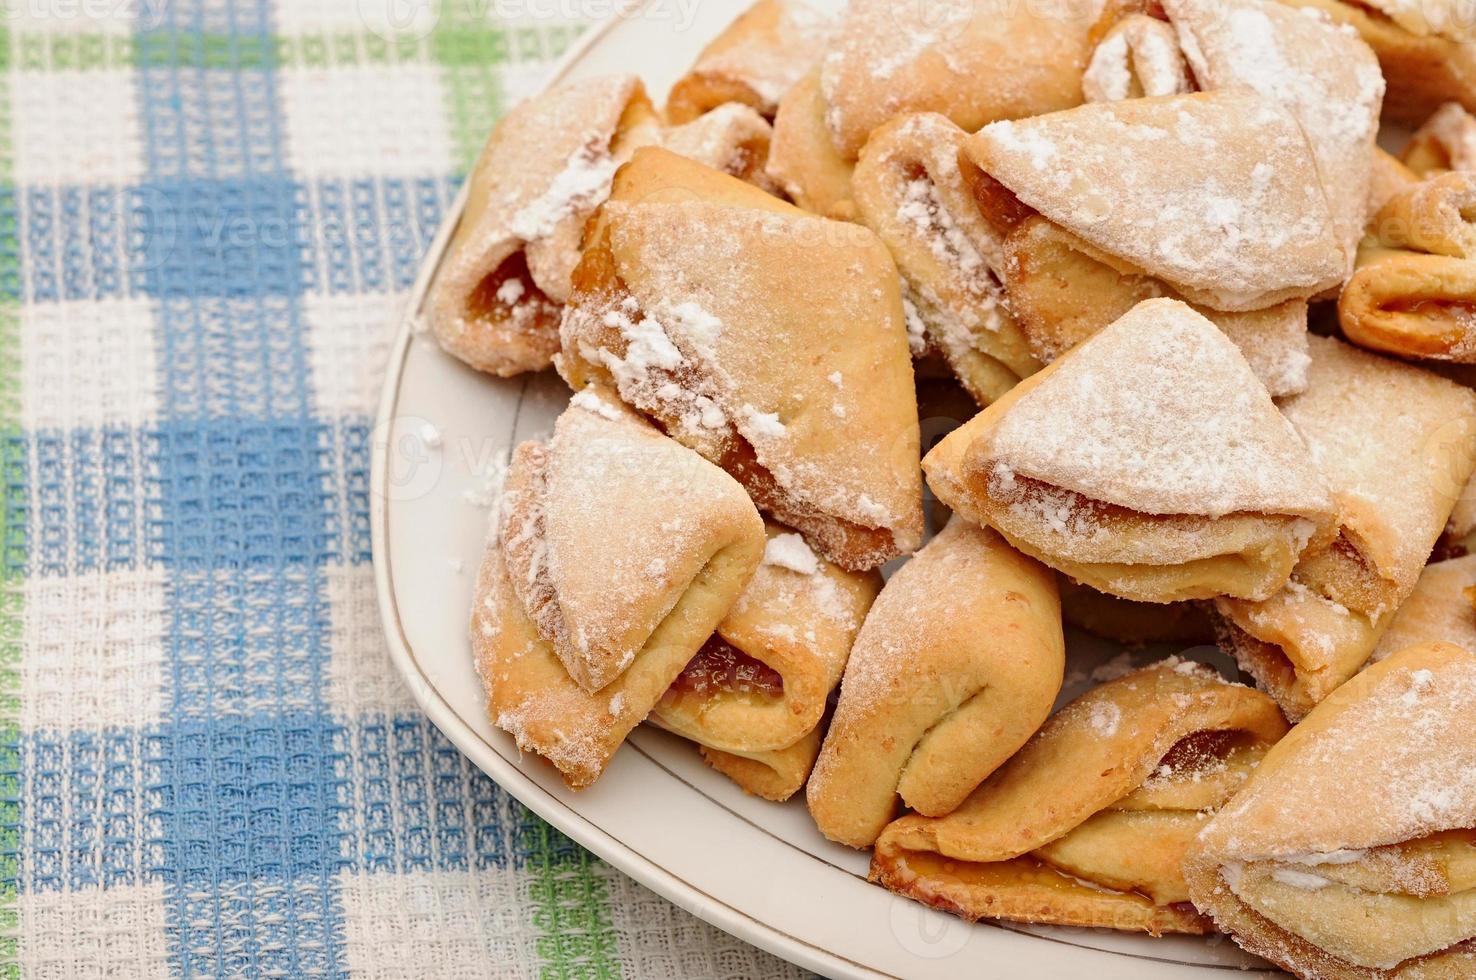 Galletas caseras de requesón con mermelada de manzana foto